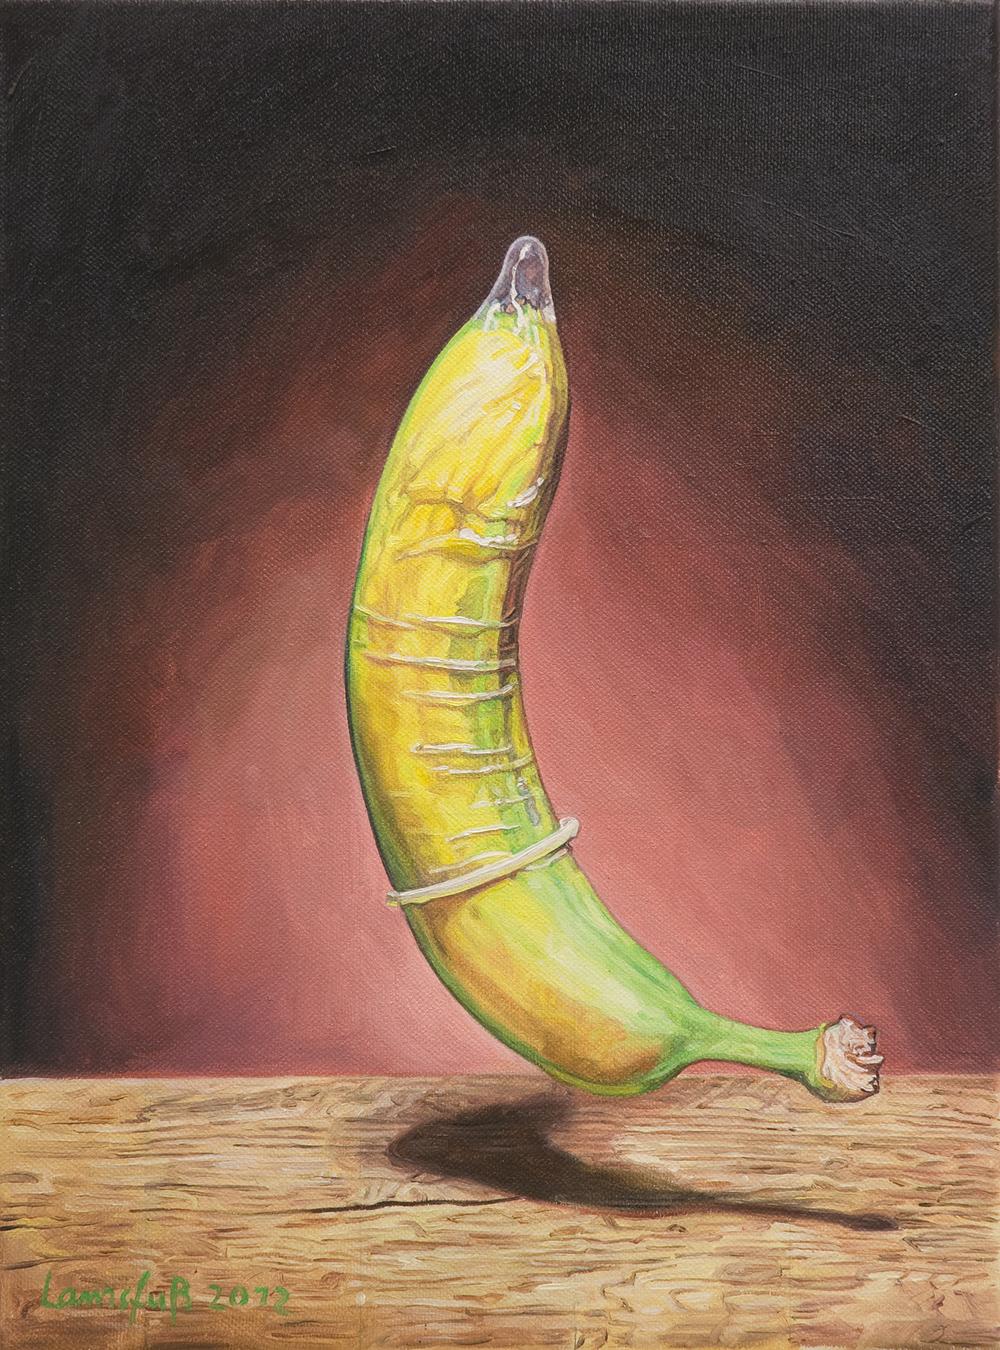 Ulrich Lamsfuss   Anthony Bradshaw, Banana (getty im. #105065566)  , 2012   oil on canvas   13.78 x 10.24 inches   35 x 26 cm